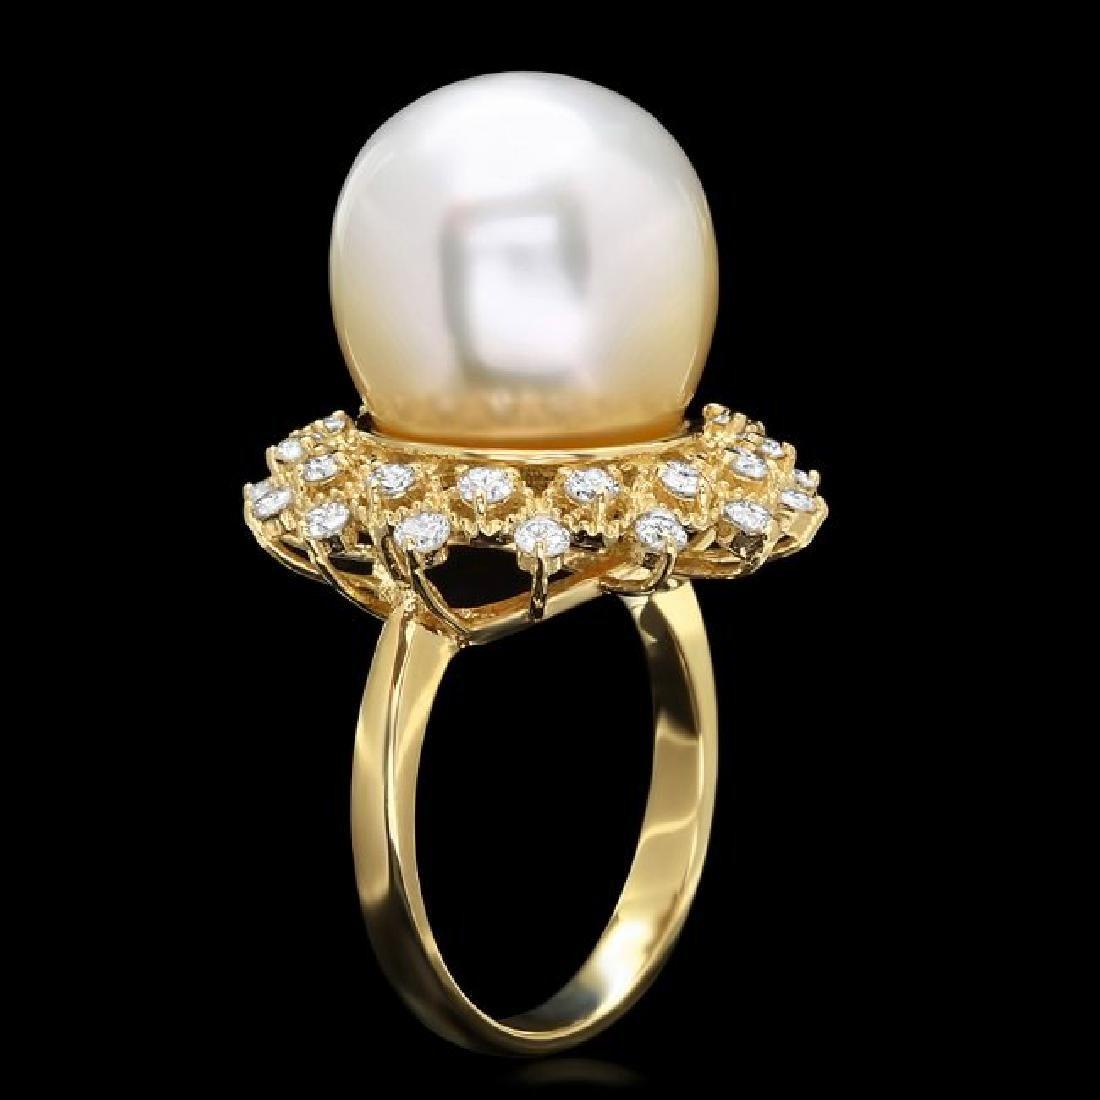 14k Gold 14 X 14mm Pearl 1.00ct Diamond Ring - 2